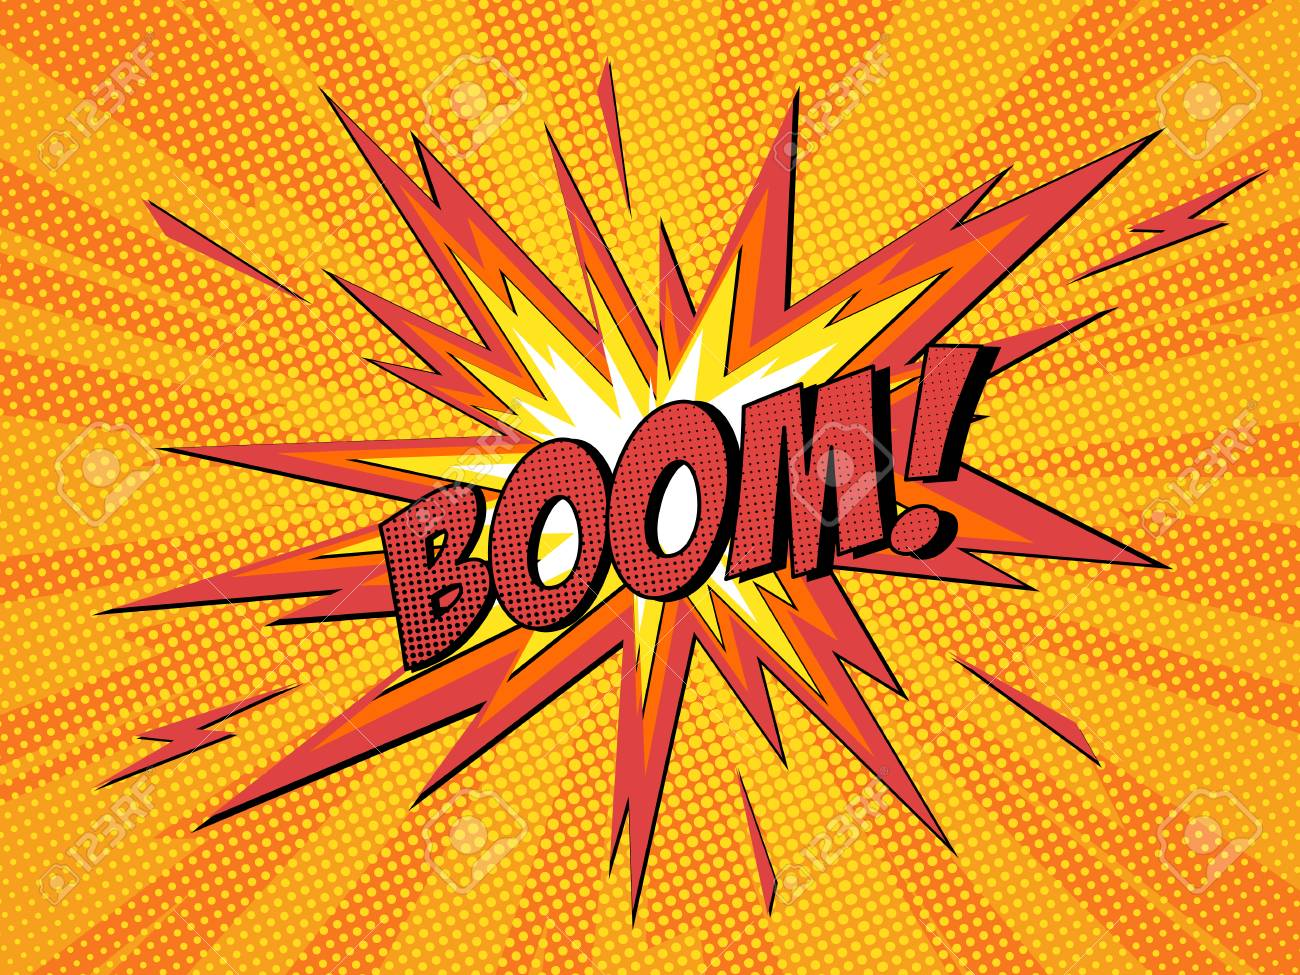 boom comic speech bubble cartoon lightning blast vector illustration royalty free cliparts vectors and stock illustration image 98887680 boom comic speech bubble cartoon lightning blast vector illustration